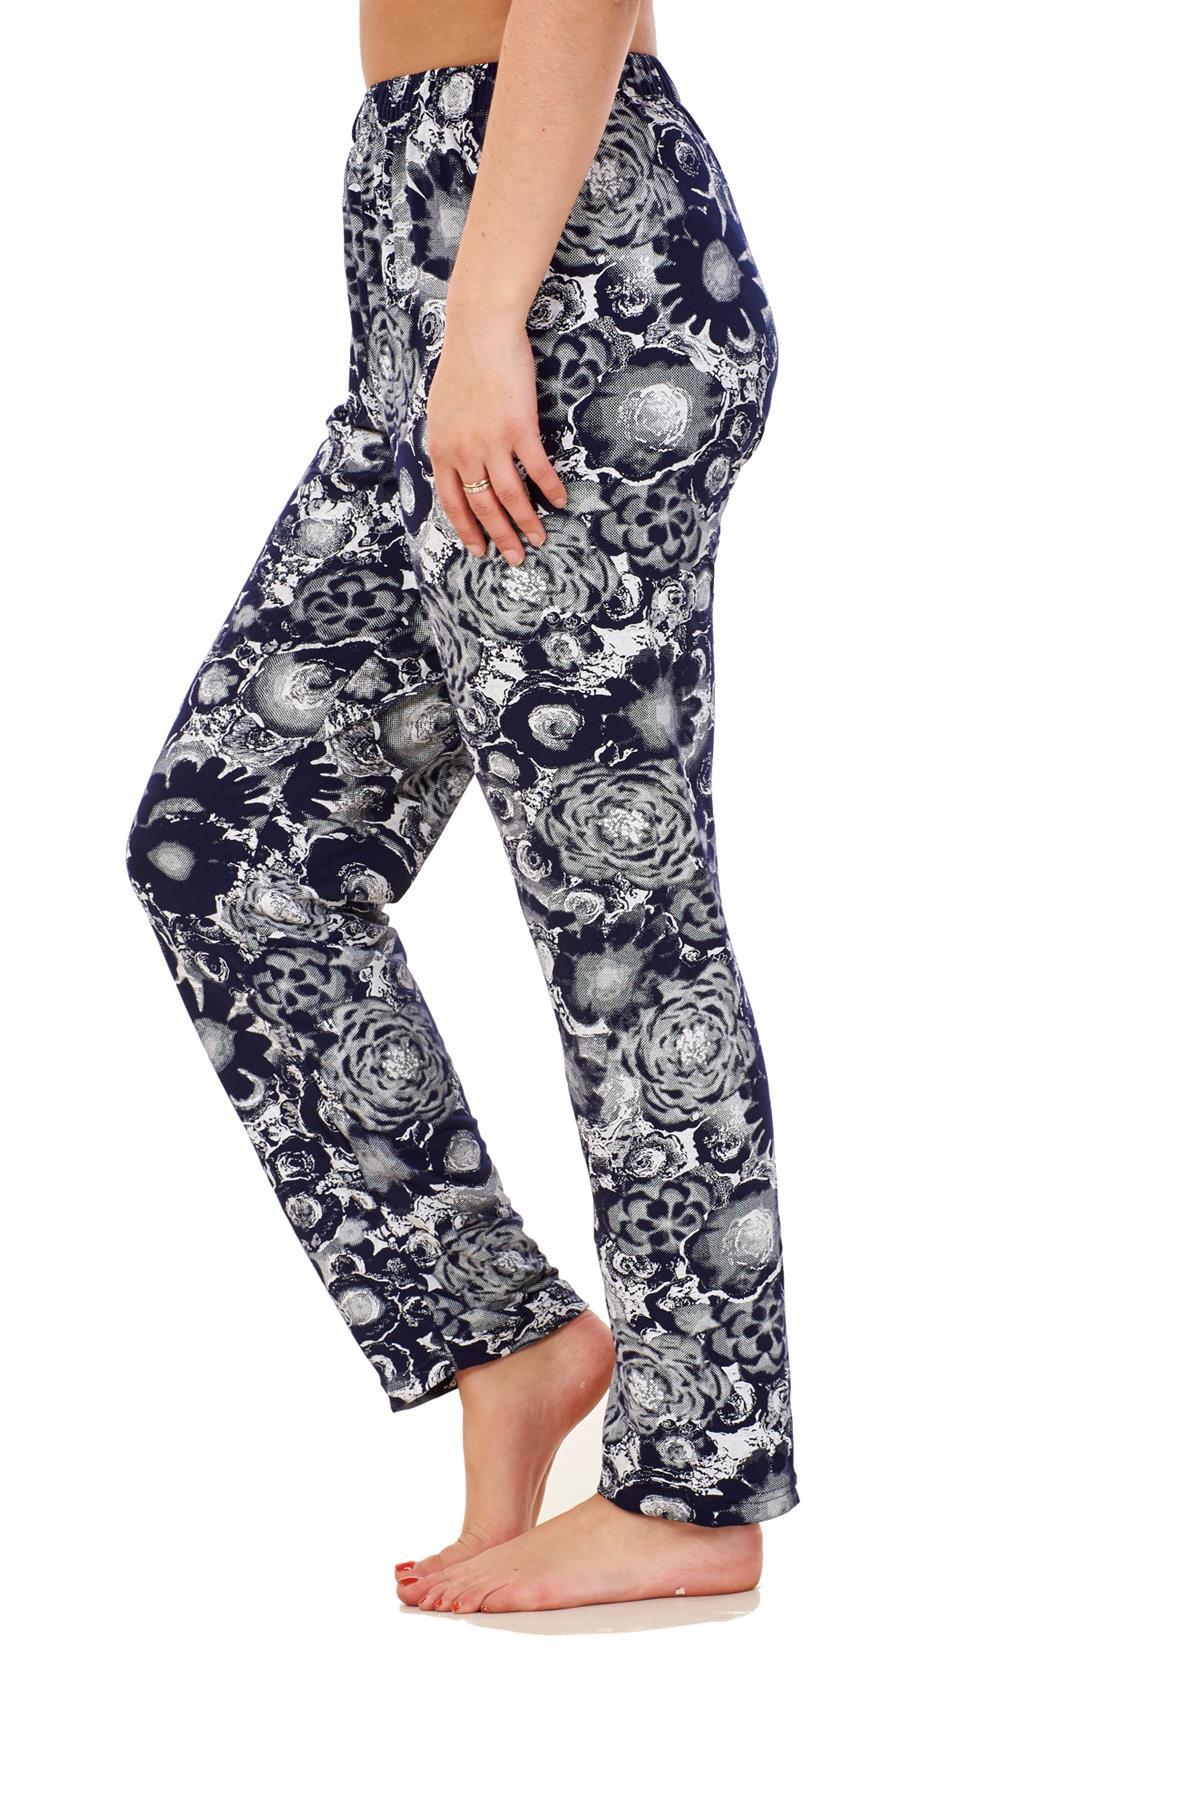 Ladies-Women-Trouser-Elasticated-Printed-Tapered-Harem-High-waist-Regular-Pants thumbnail 7